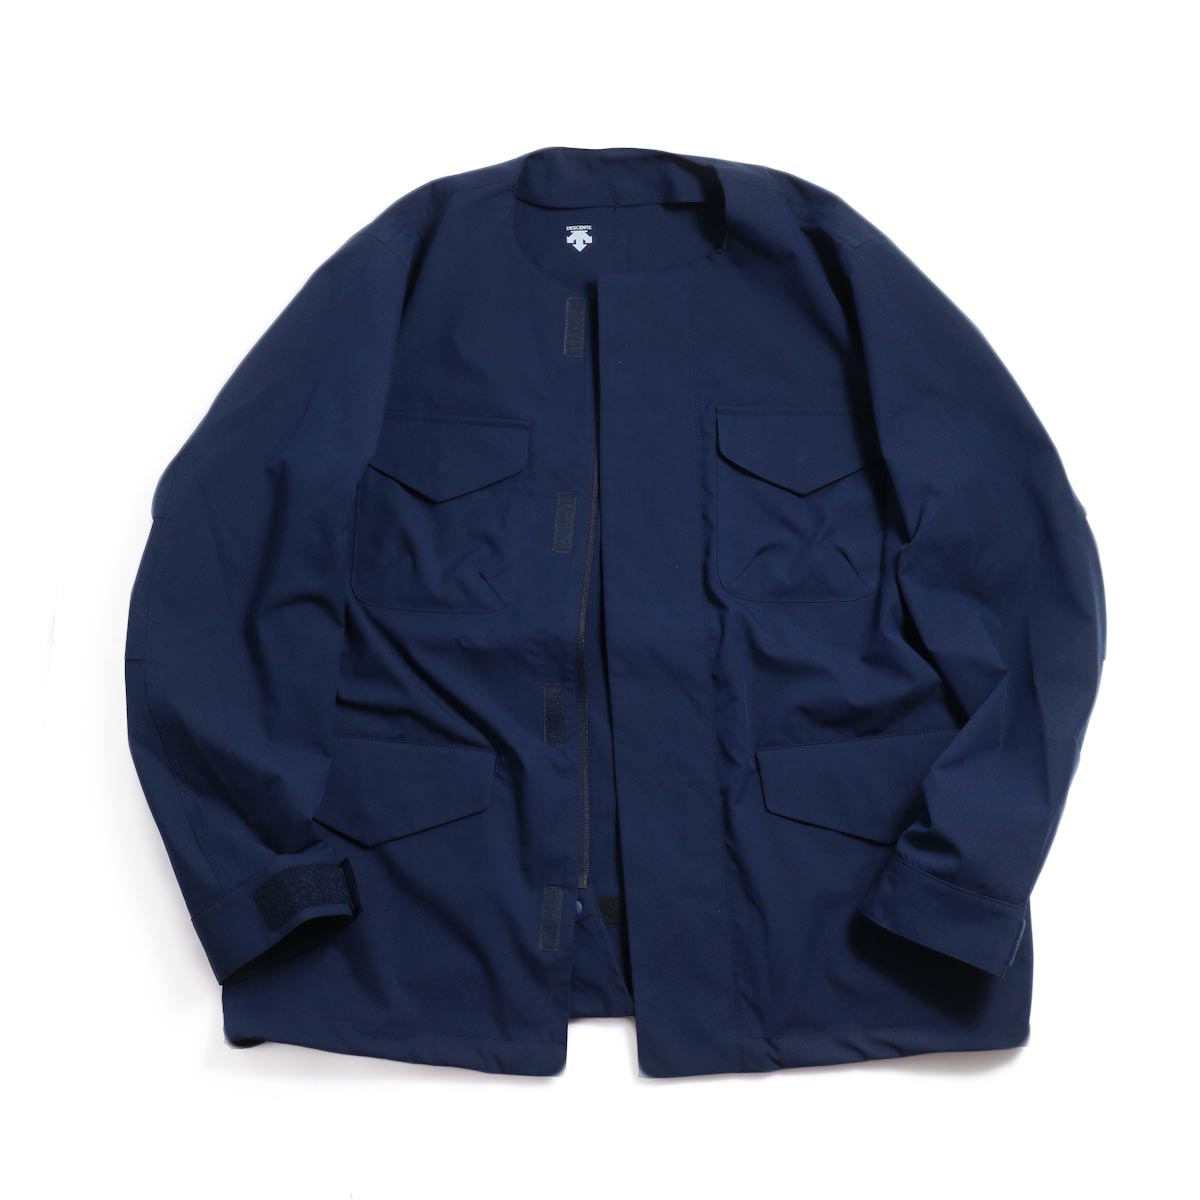 DESCENTE ddd / Utility Jacket -Navy 正面2